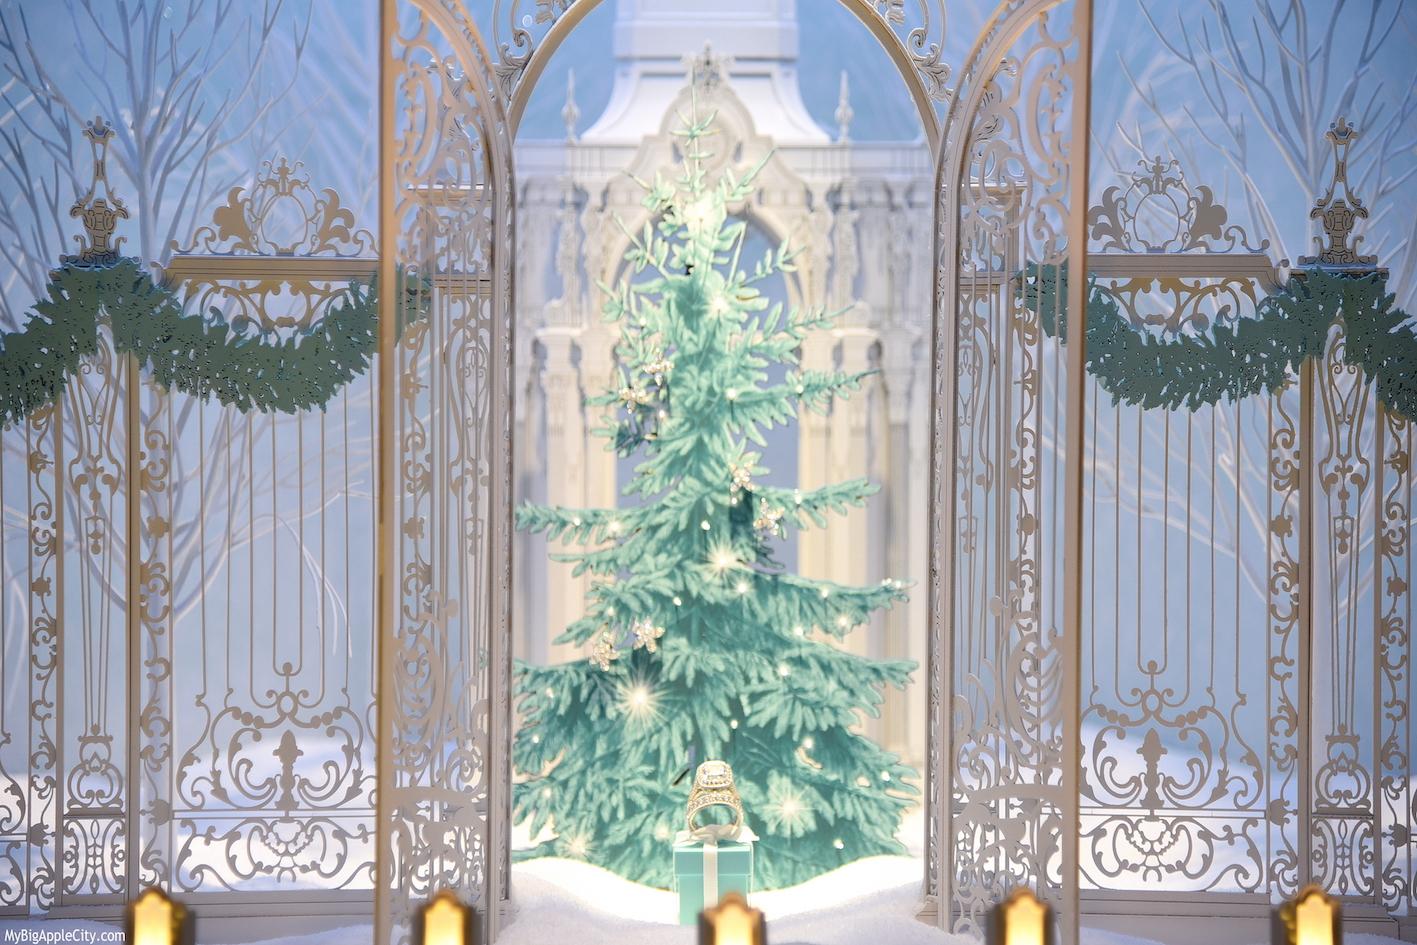 Tiffanys-Christmas-Holiday-windows-new-york-travelblogger-mybigapplecity